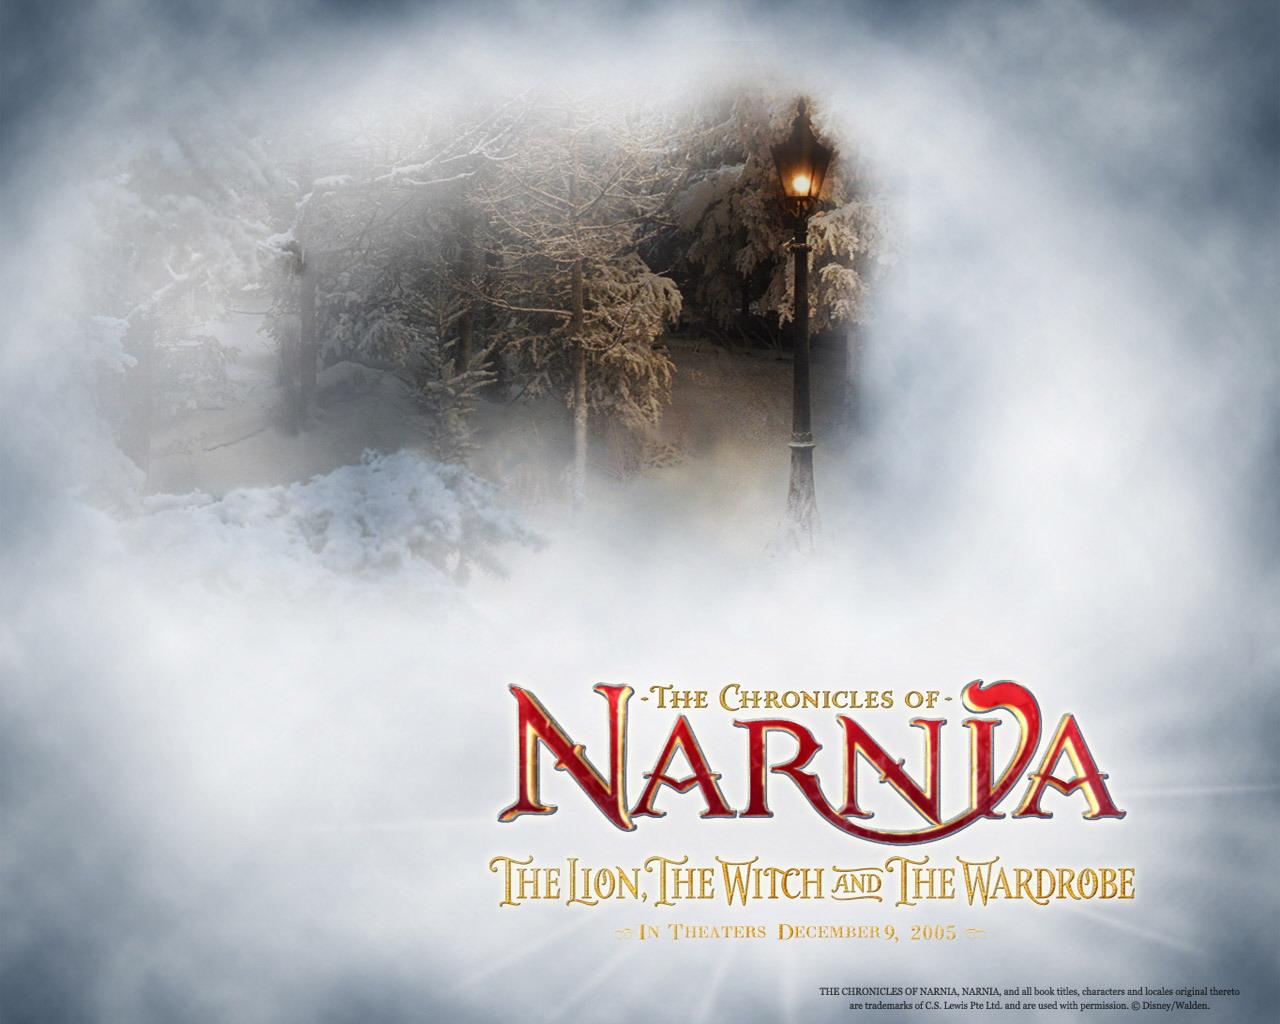 Amazing Pics Narnia HD Widescreen 24 Wallpapers 1280x1024